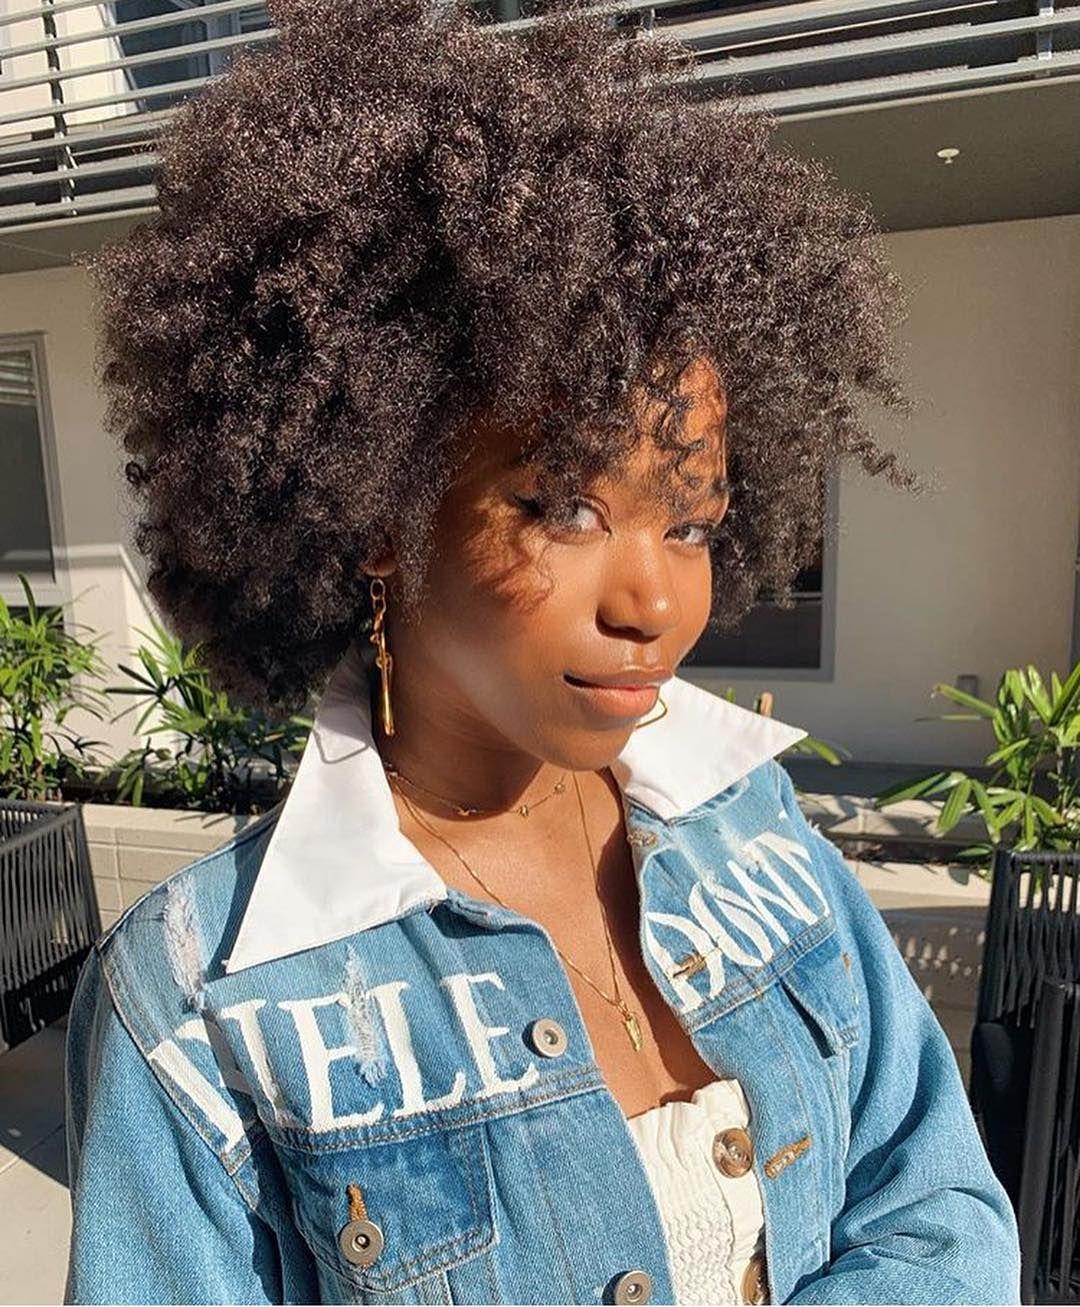 pretty black girls instagram names